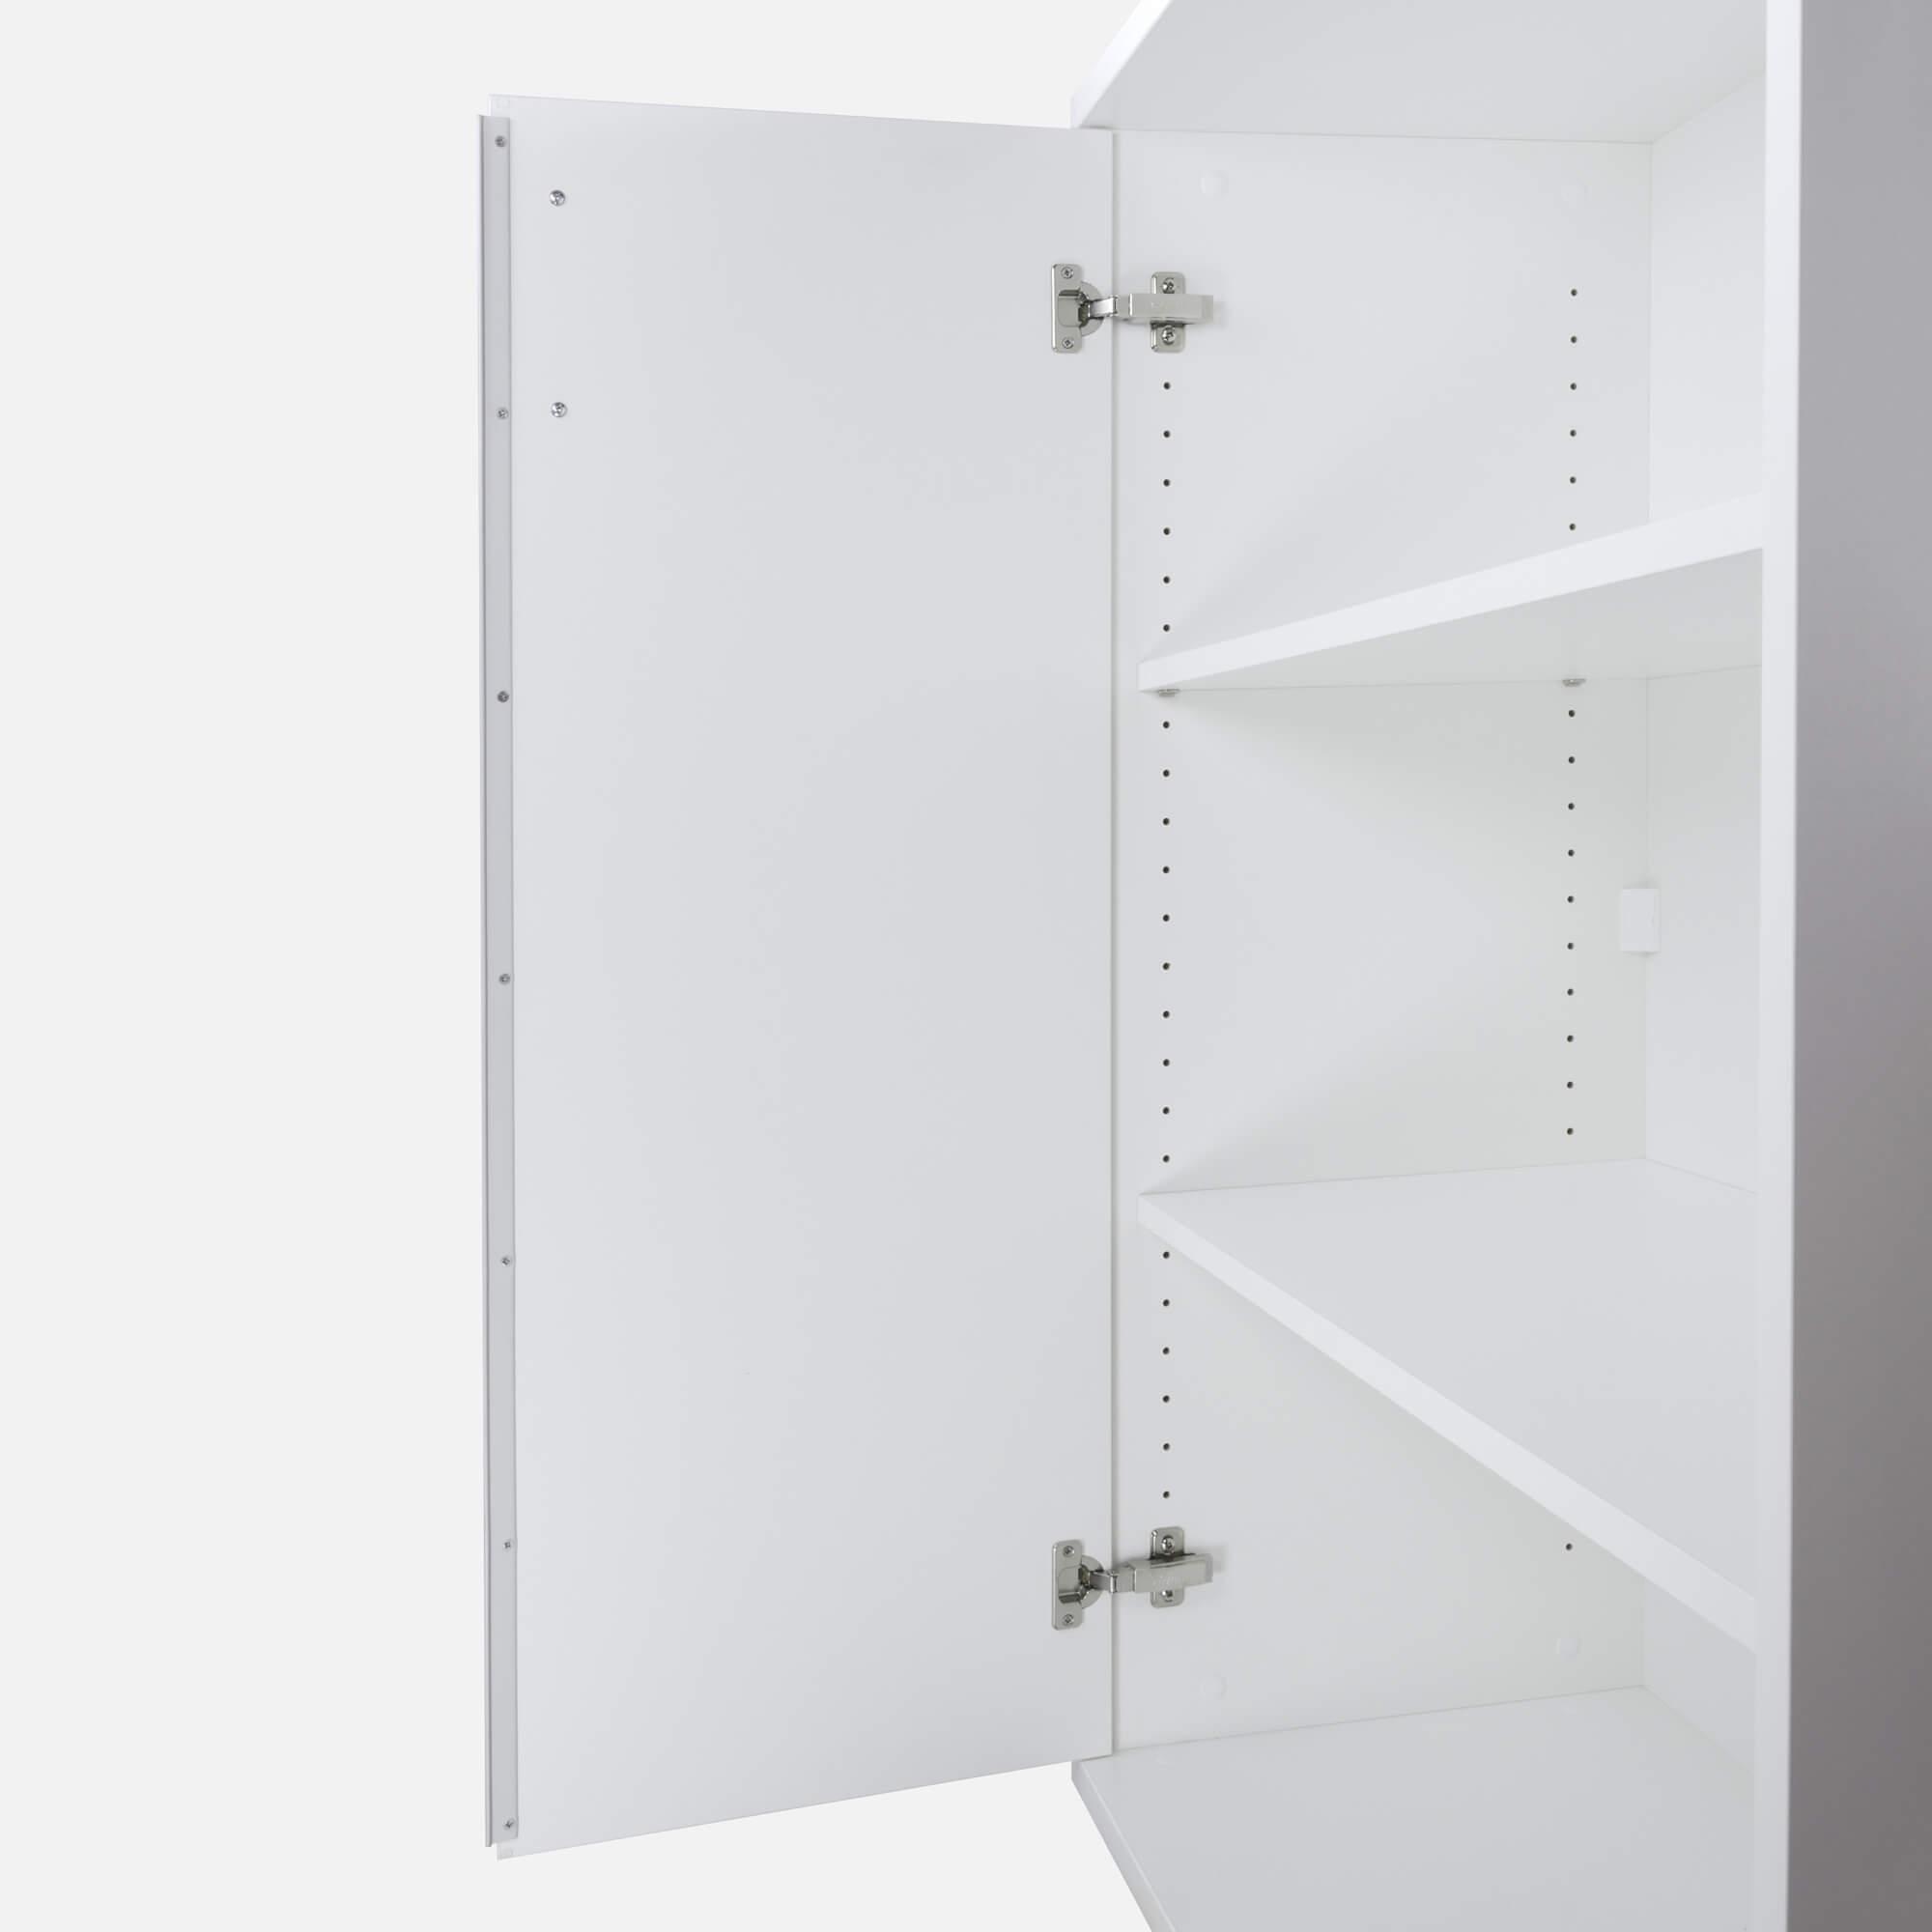 profi aktenschrank abschlie bar 3oh wei schrank. Black Bedroom Furniture Sets. Home Design Ideas